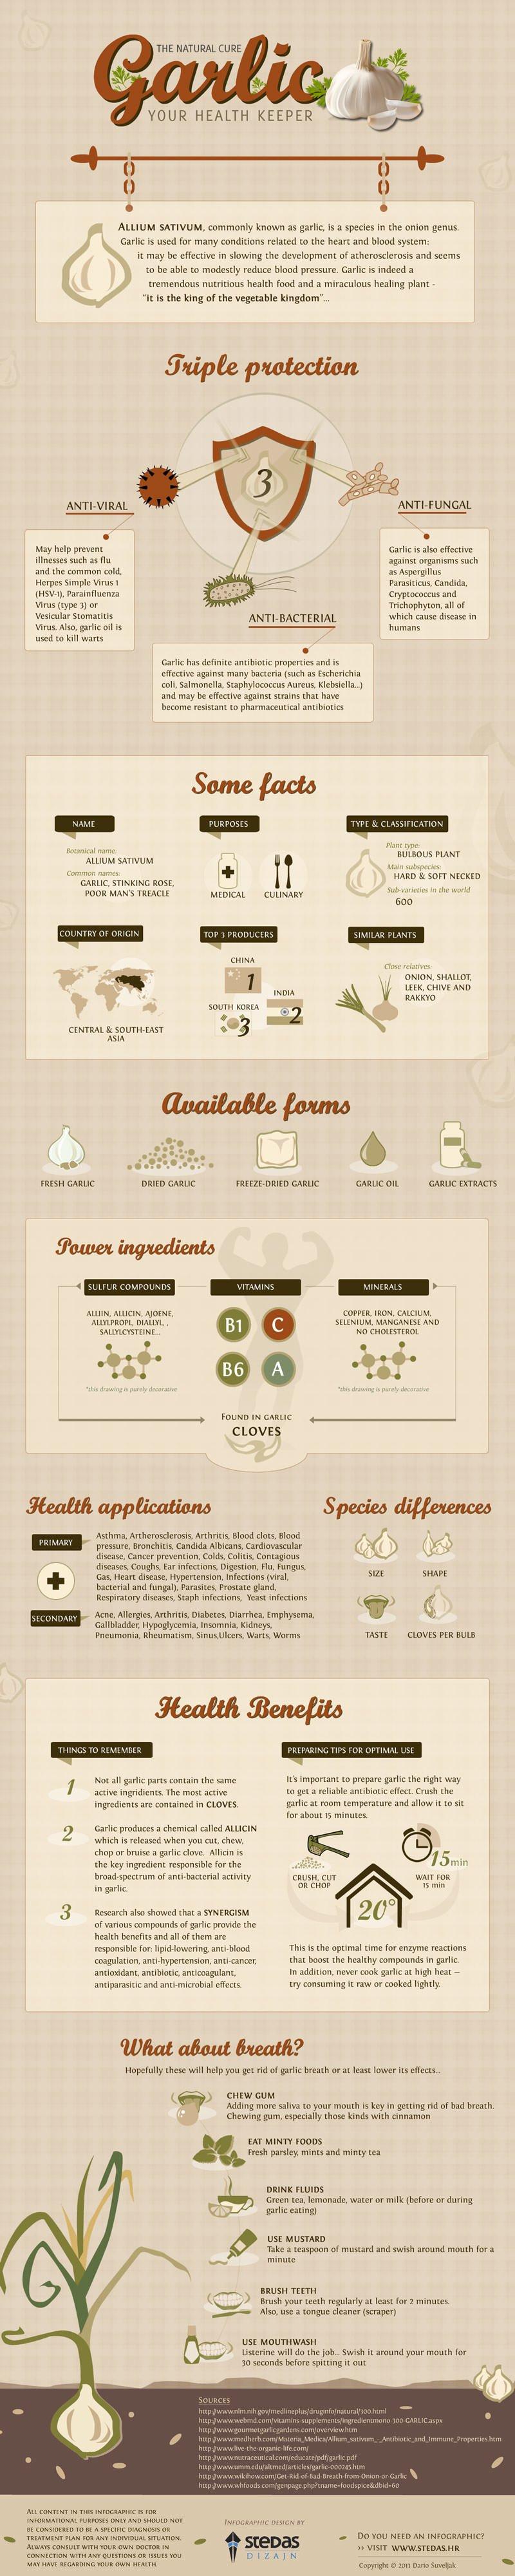 Health Benefits of Garlic Infographic